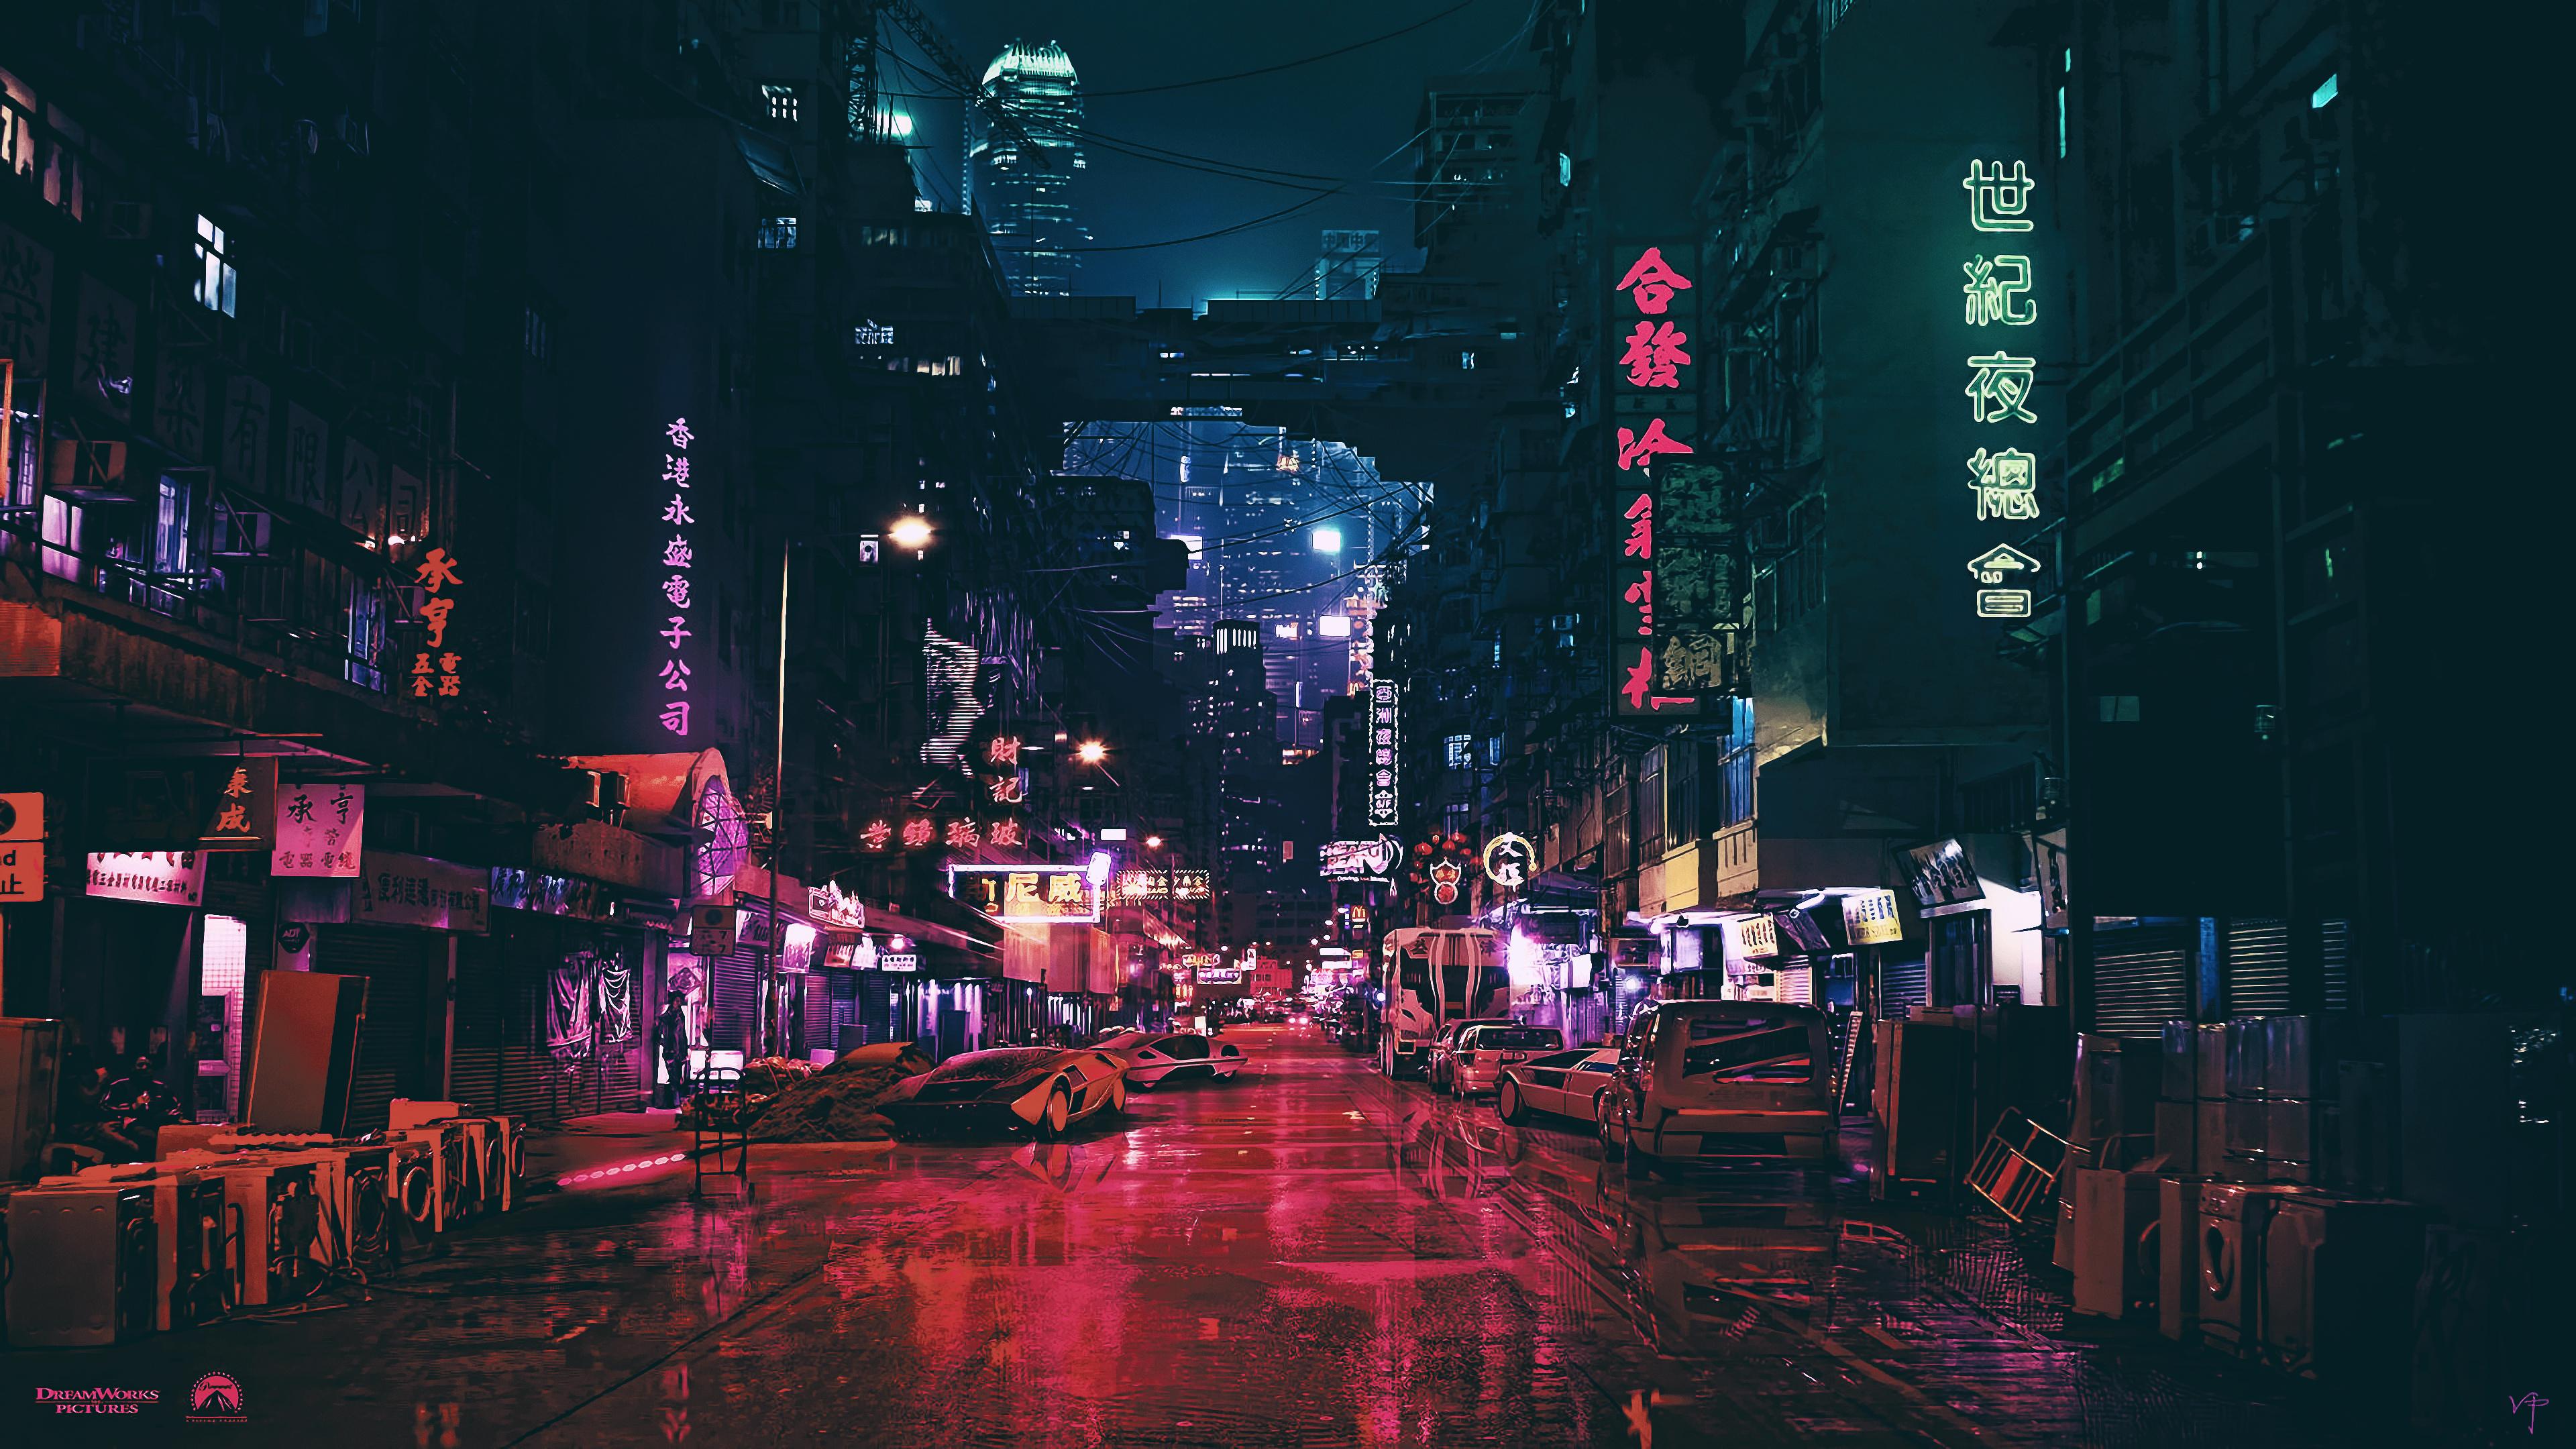 Certainly. anime futuristic city